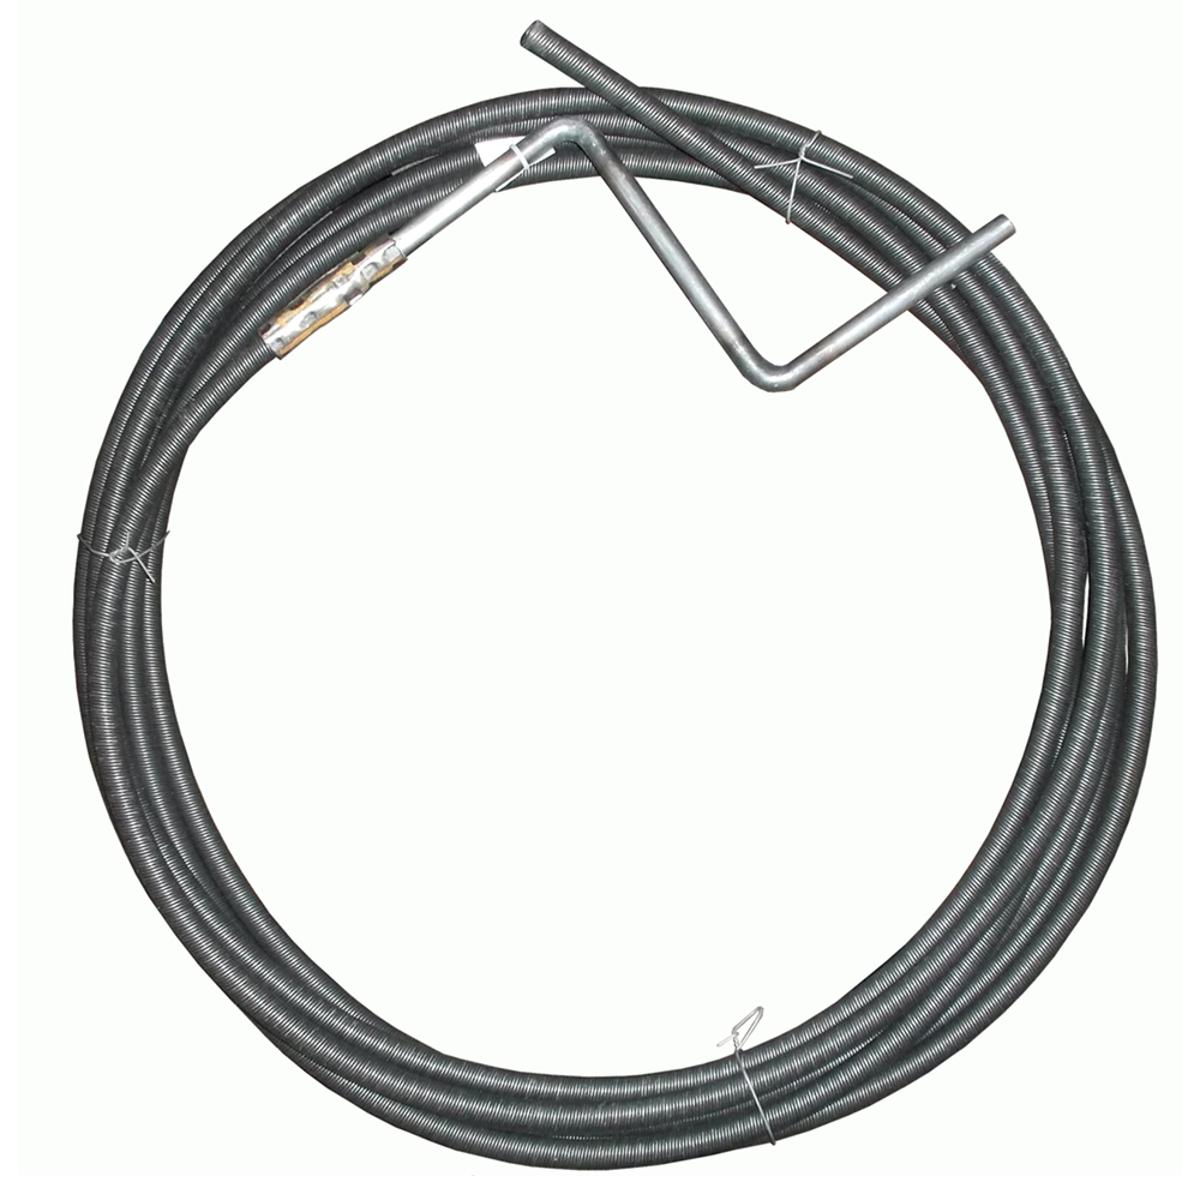 Трос для прочистки канализационных труб Masterprof, пружинный, 9 мм х 5 м трос для прочистки канализационных труб 9 мм х 10 м